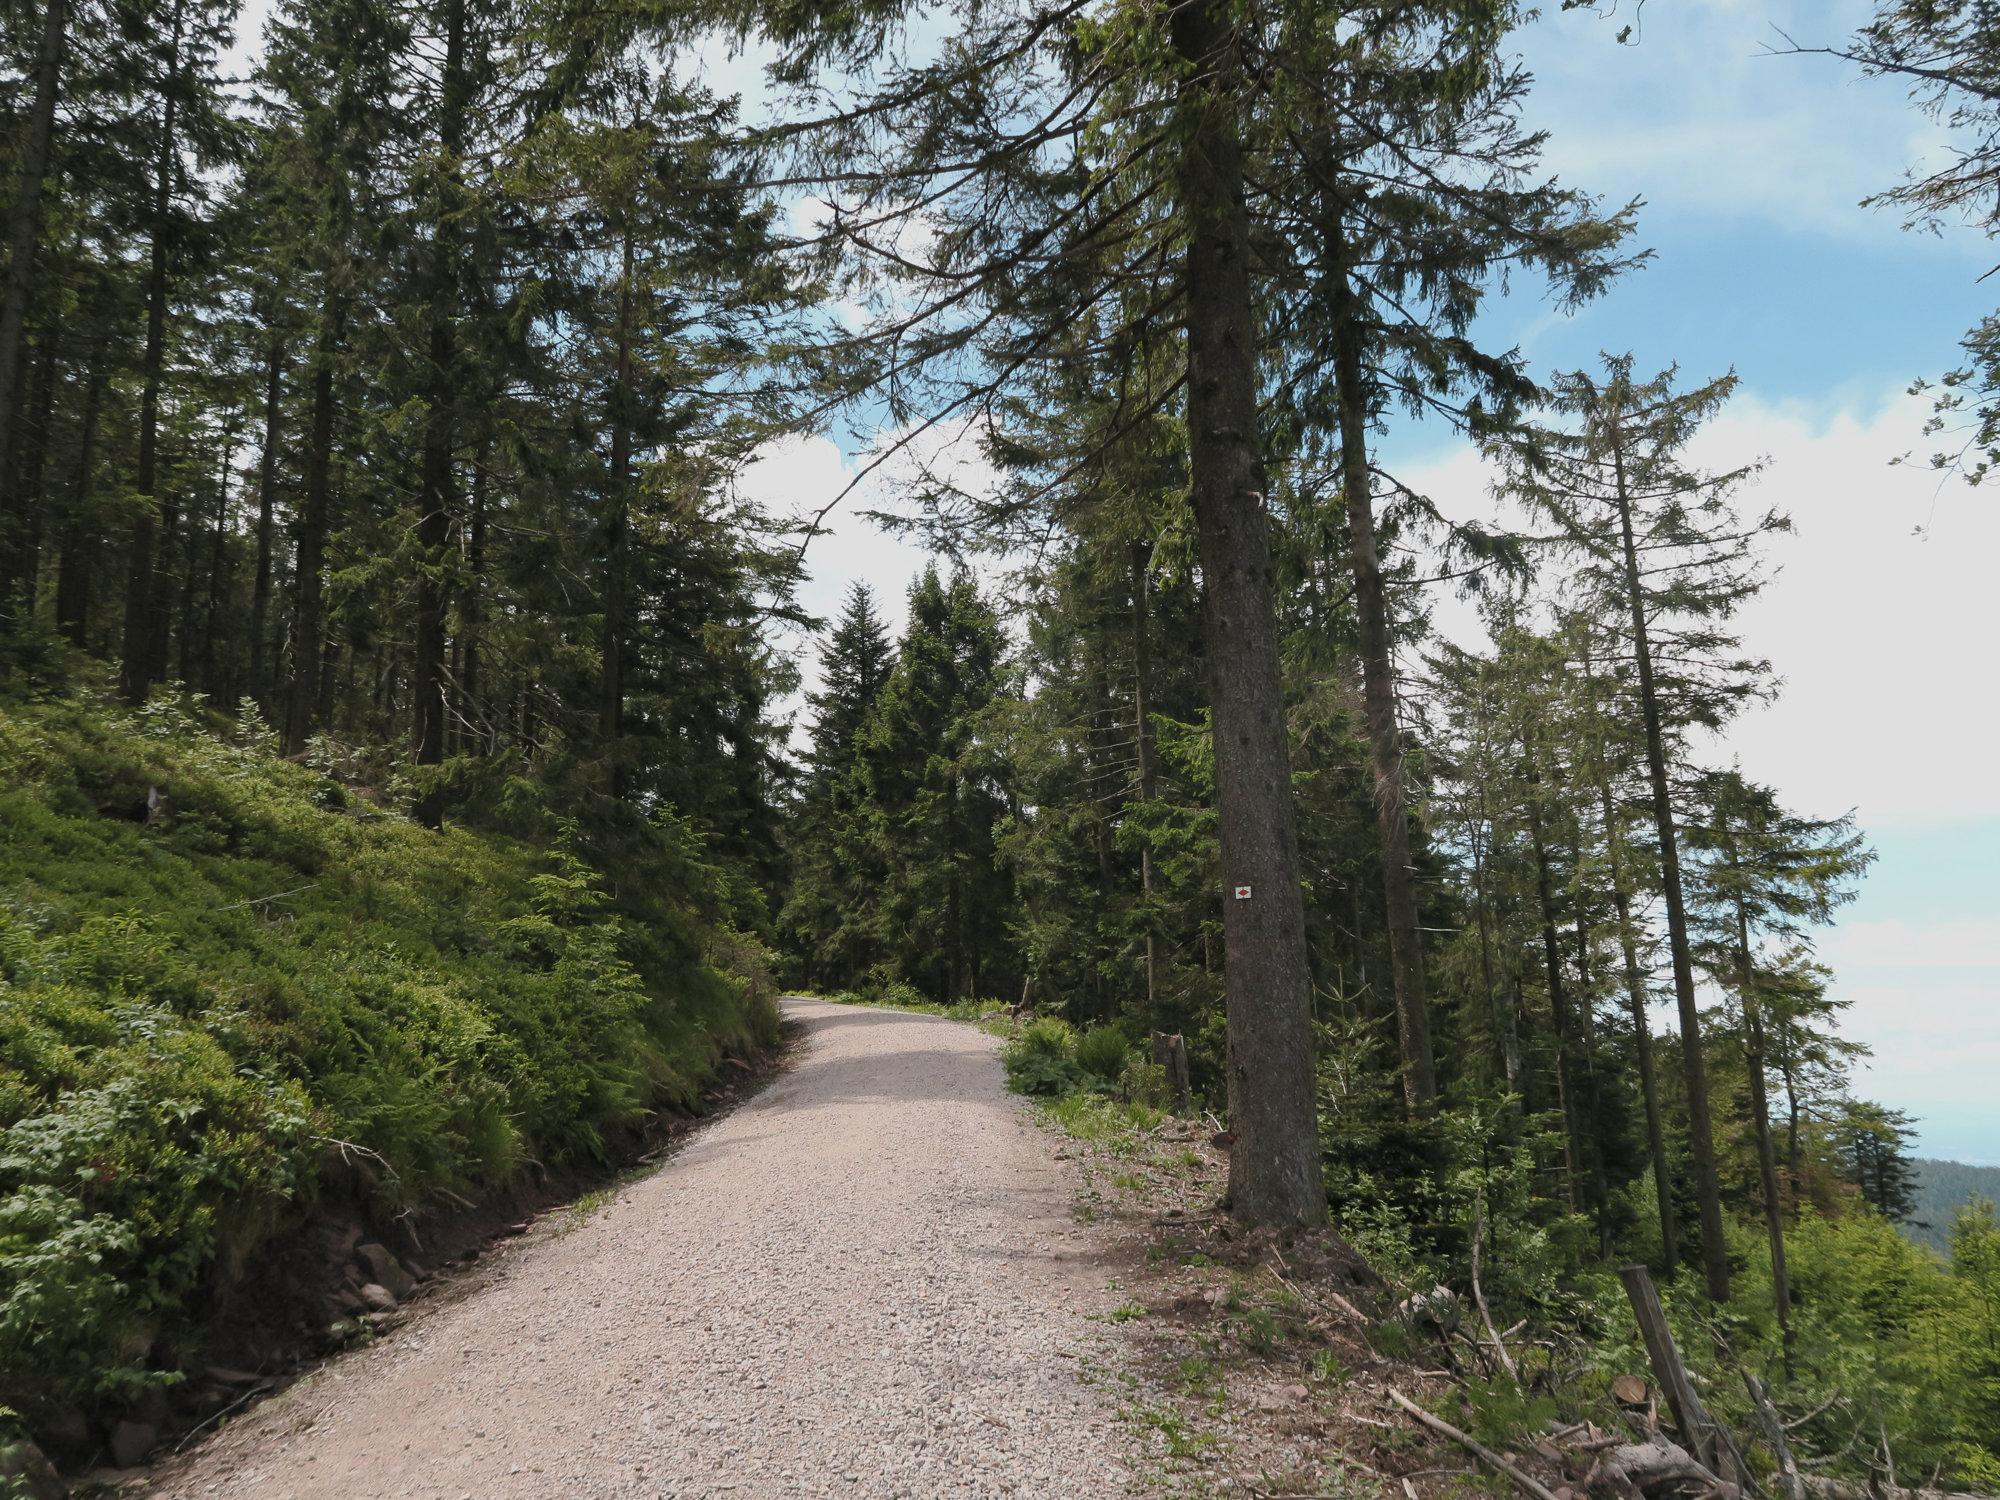 Forstweg im Schwarzwald, Trekkingtour